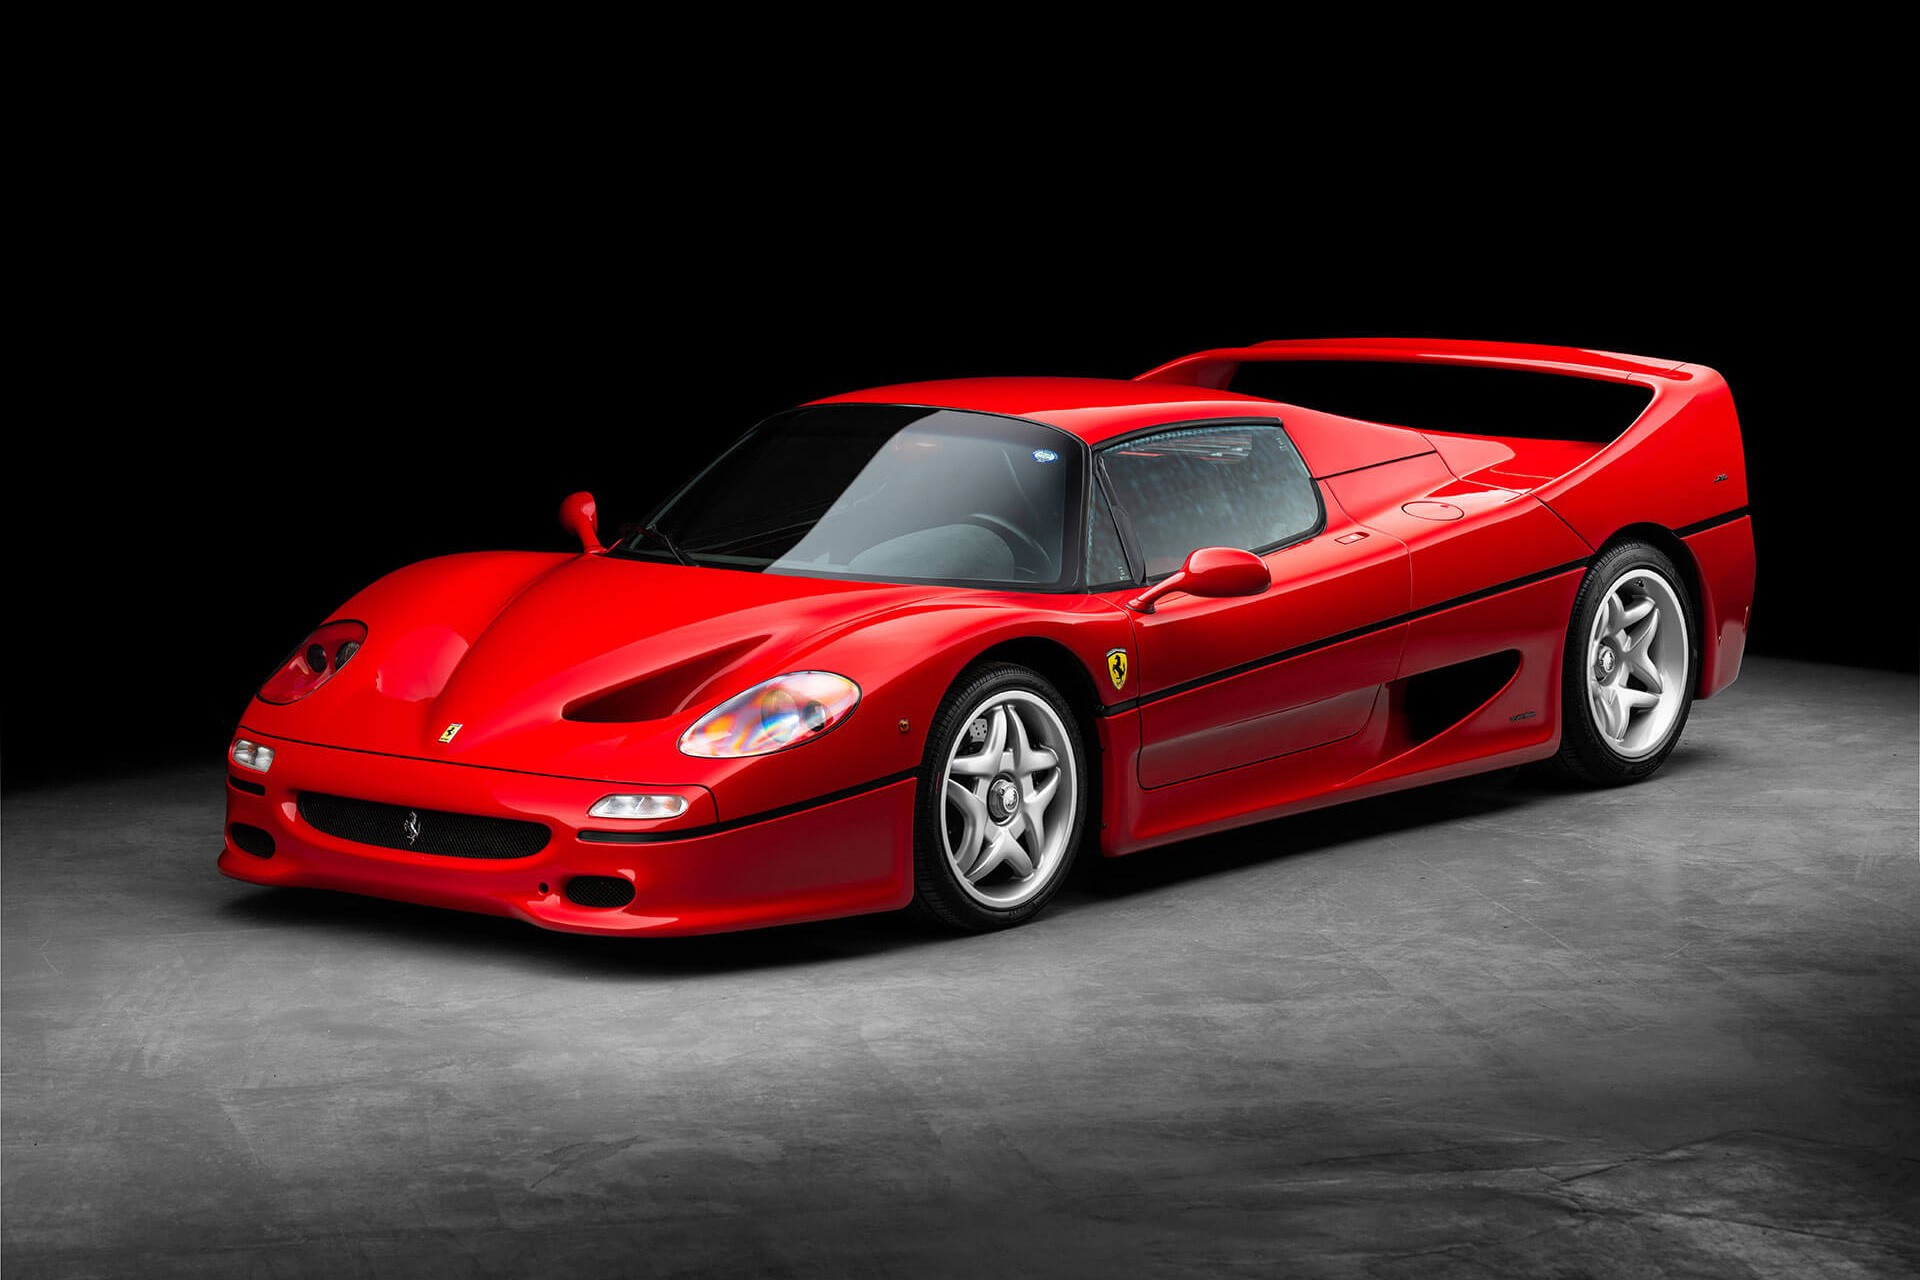 1996 Ferrari F50 Namastecar